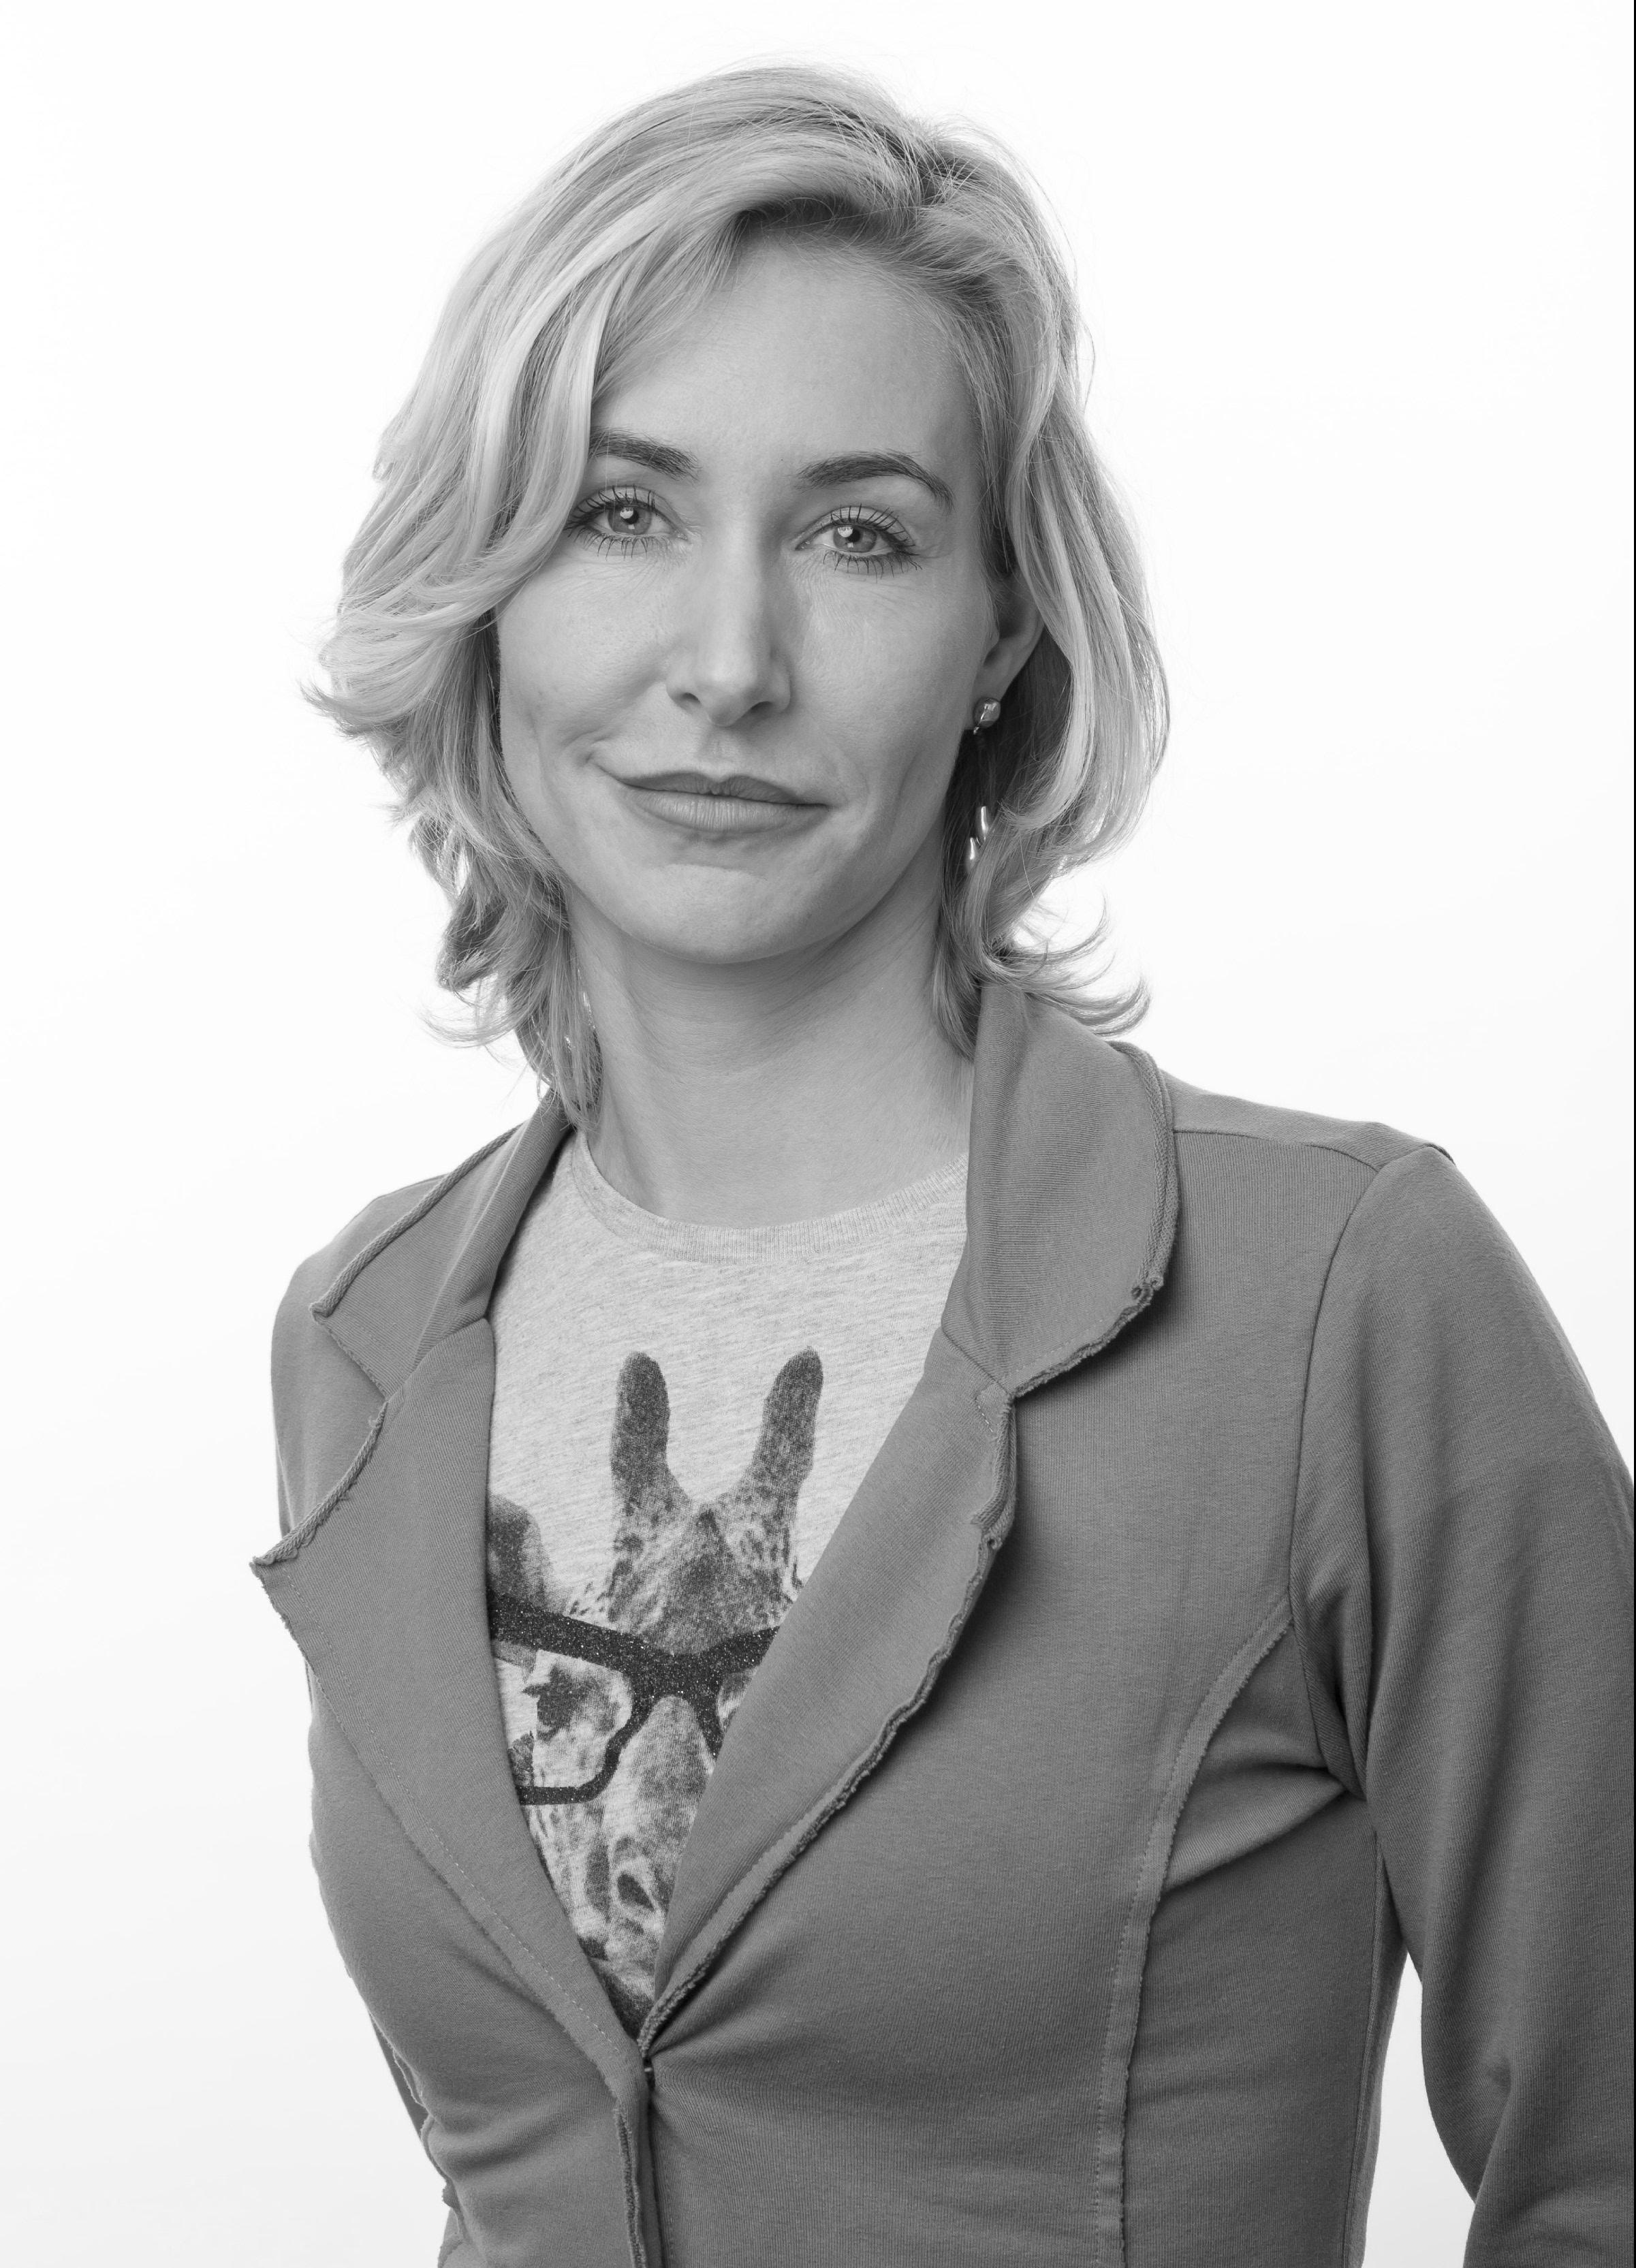 Martine Korevaar